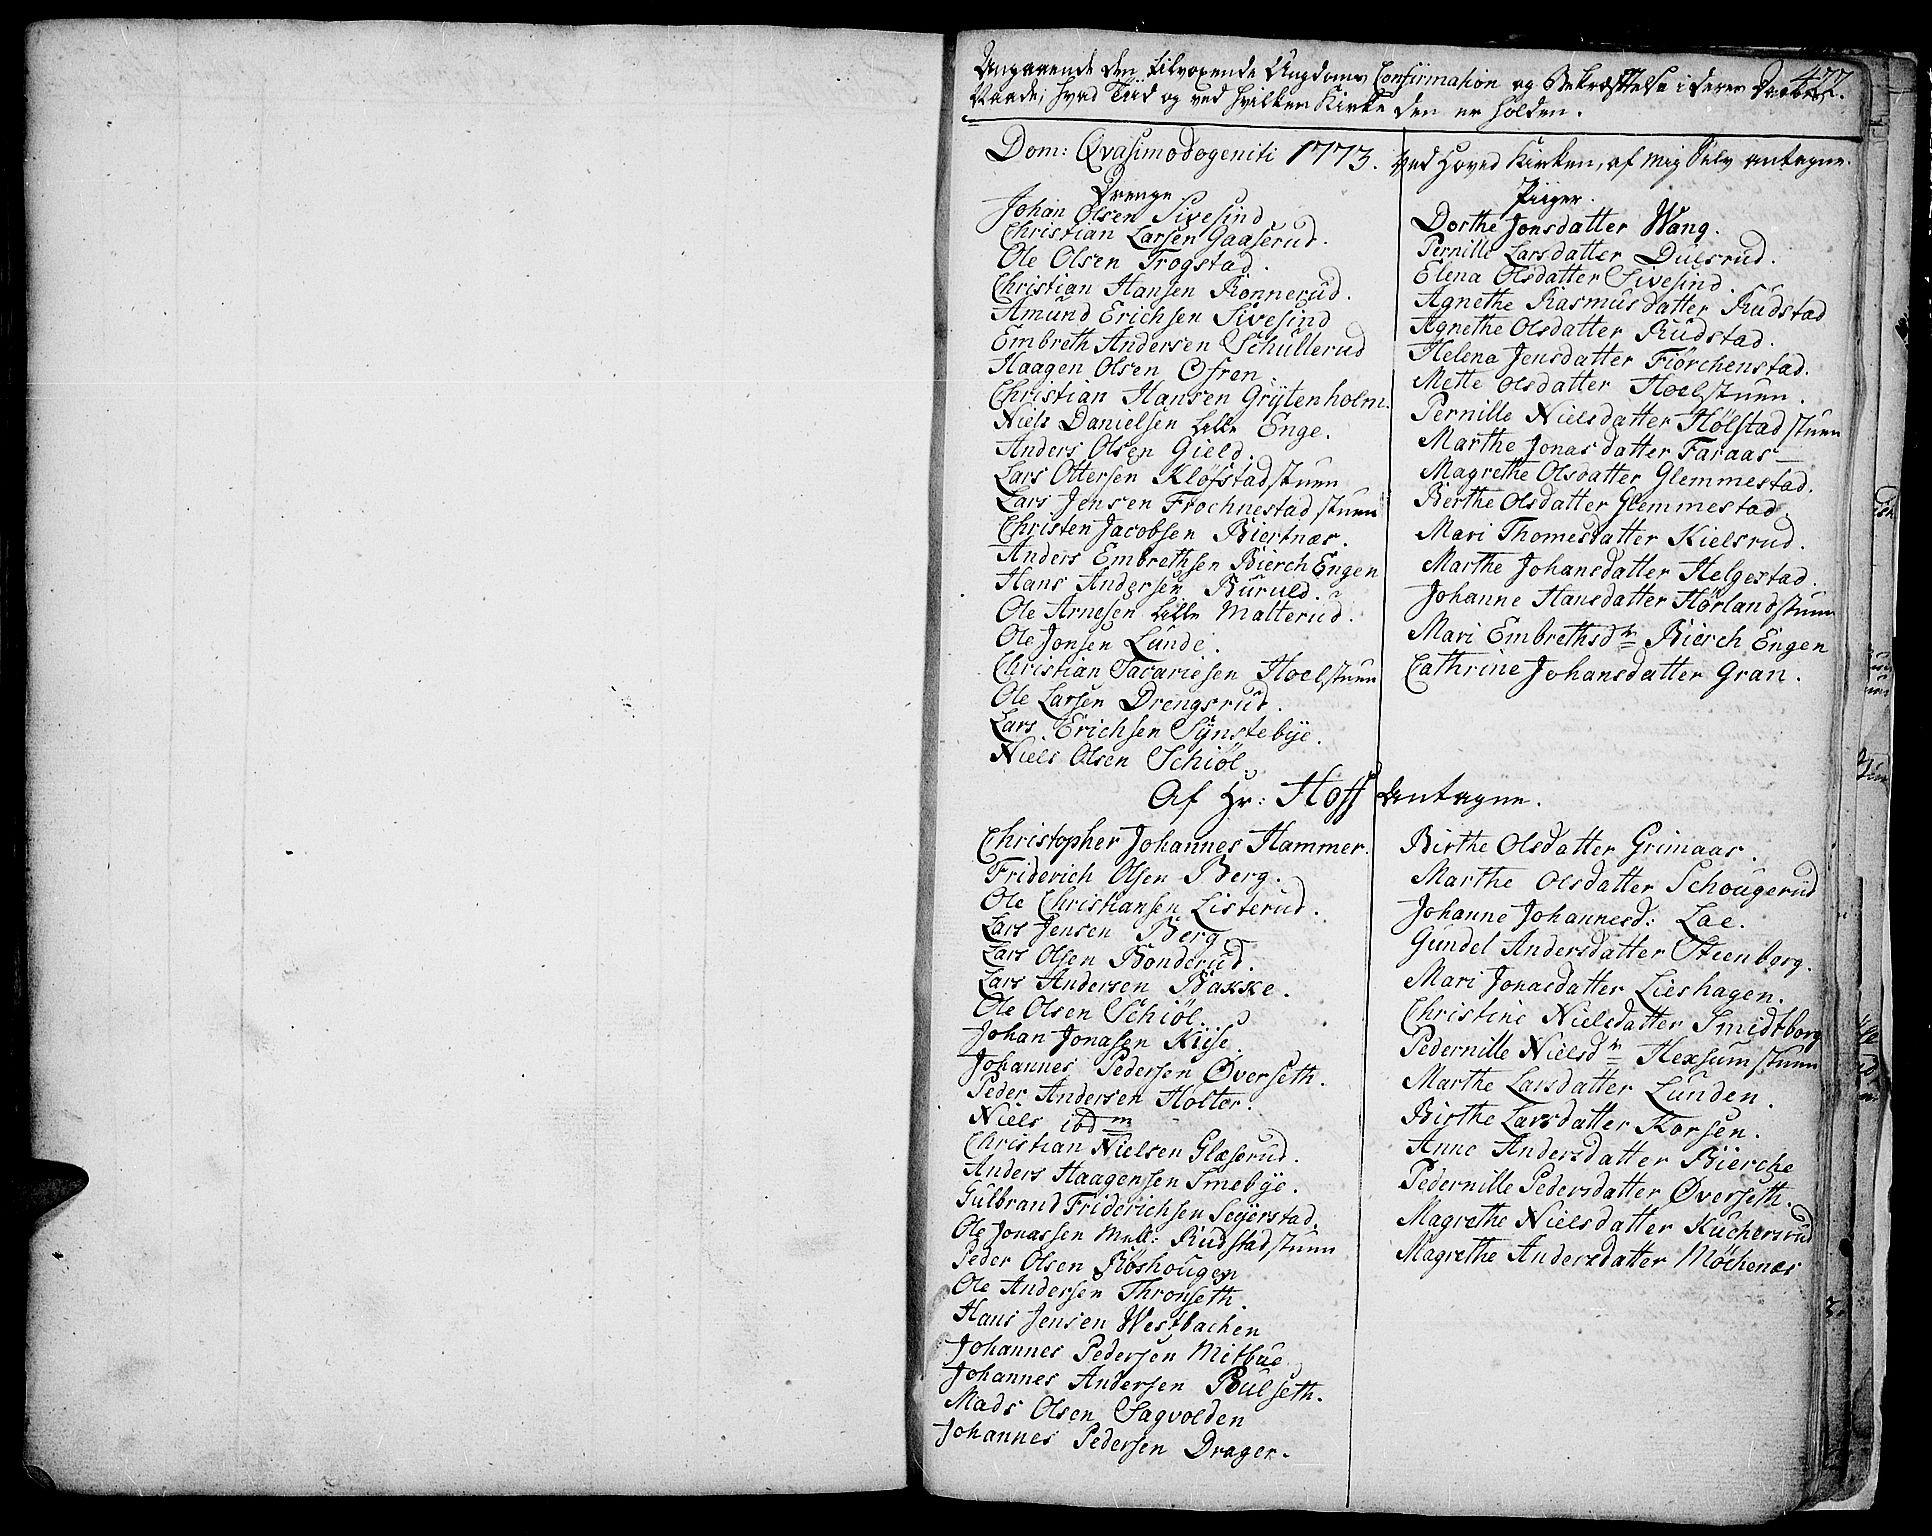 SAH, Toten prestekontor, Ministerialbok nr. 6, 1773-1793, s. 422